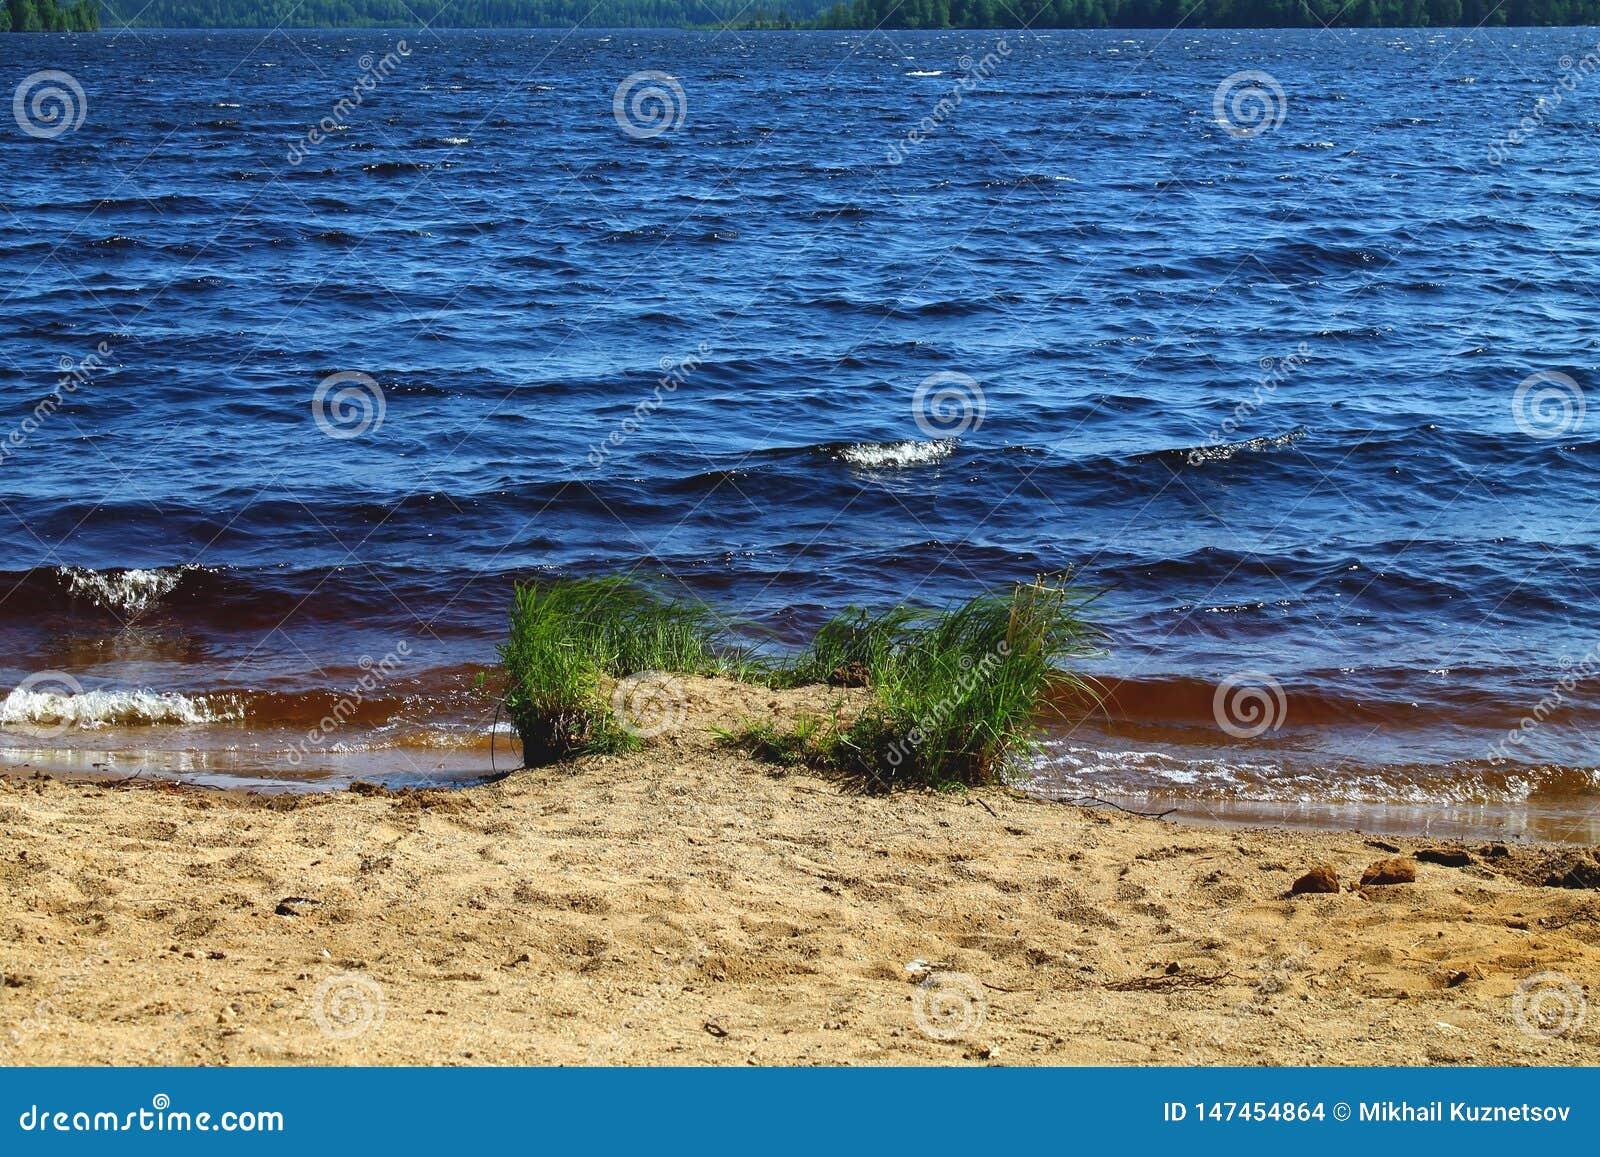 Dark color sea water splashing to sand beach on summer day